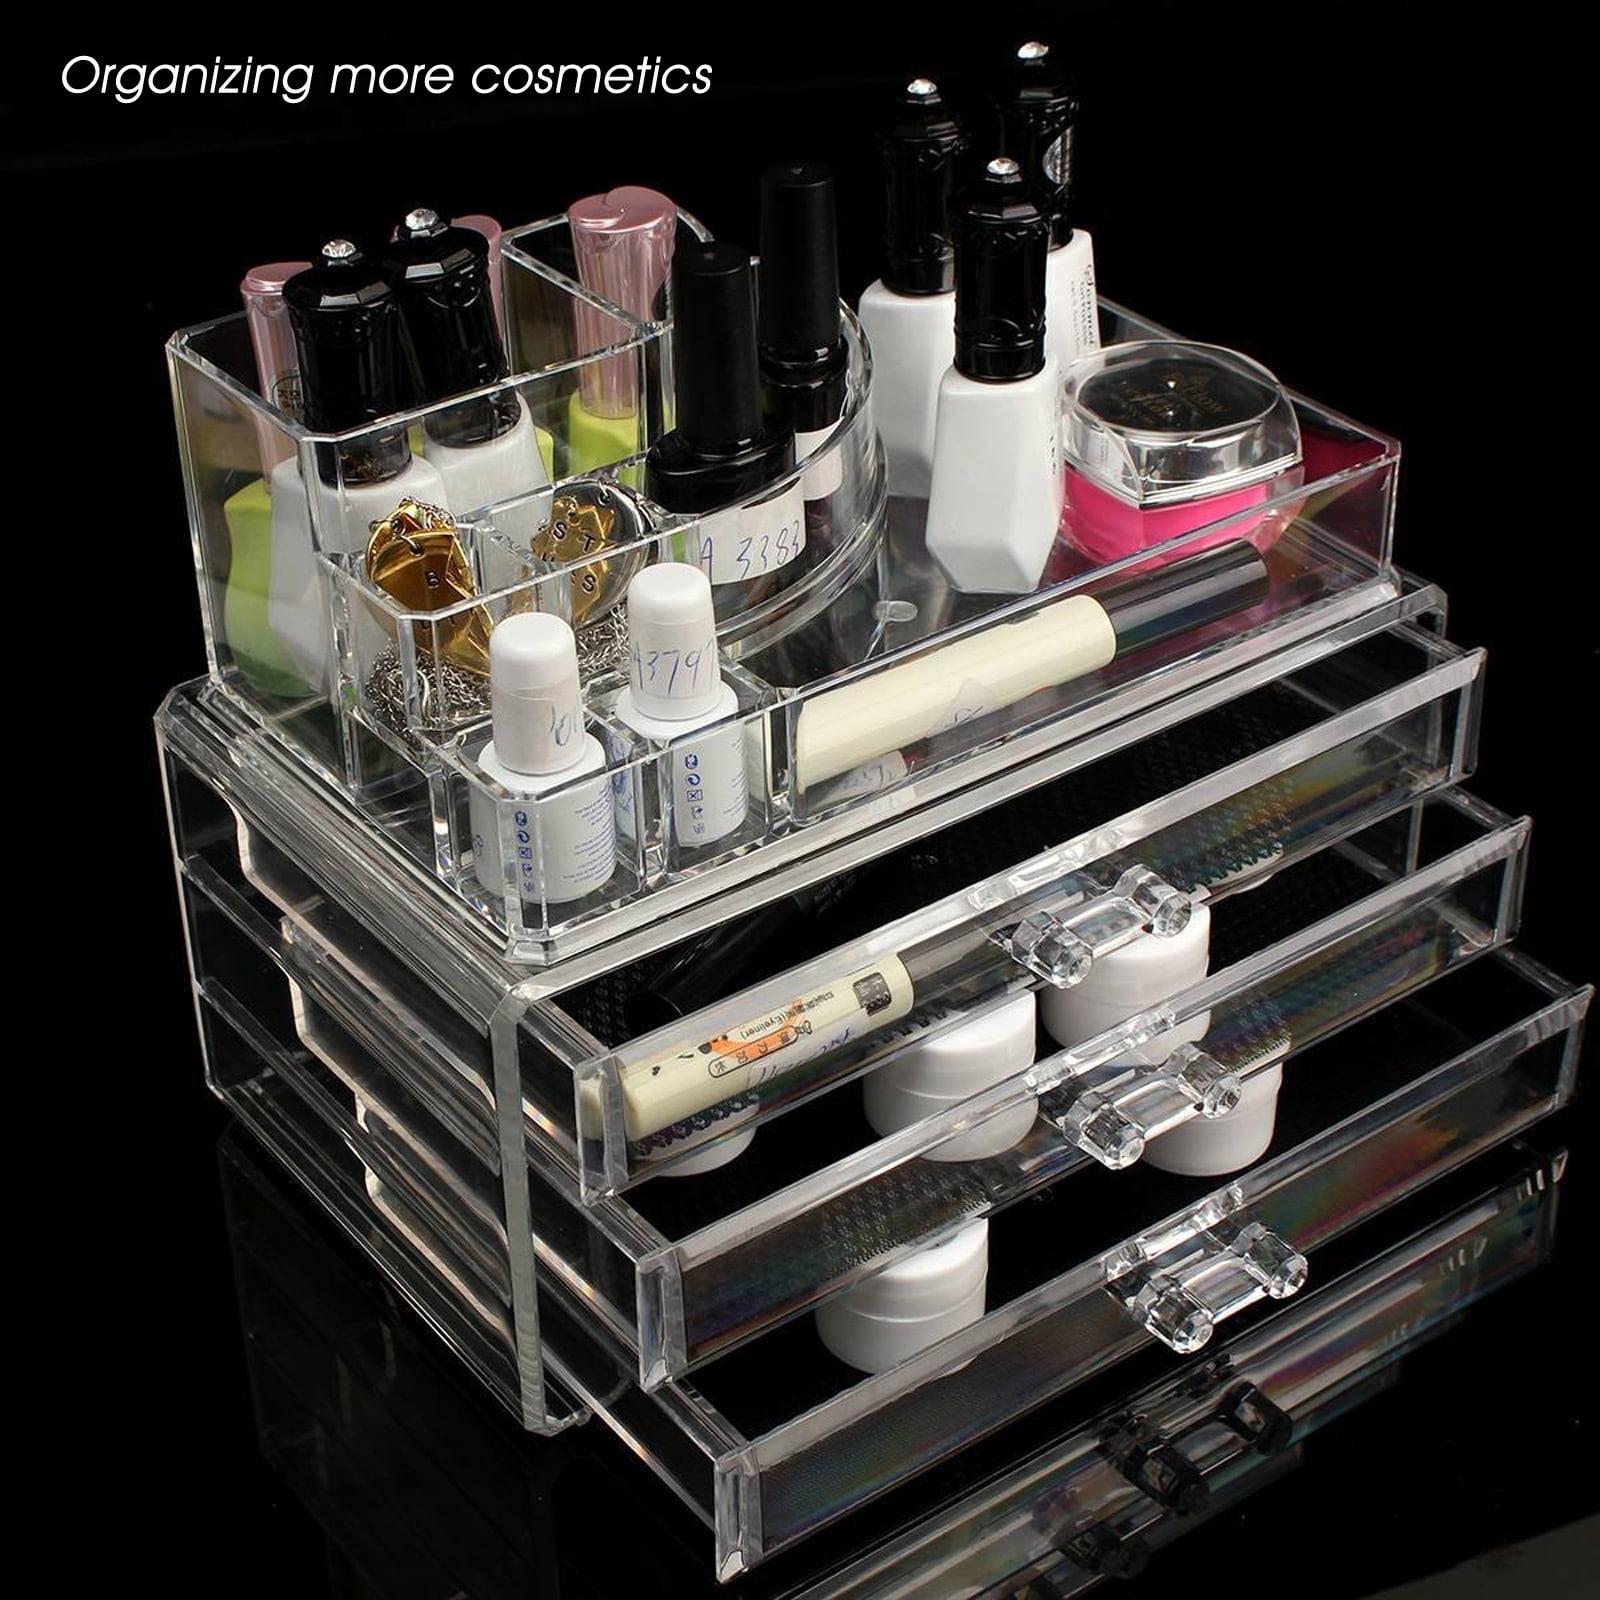 Acrylic Makeup Organizer Cosmetics Storage Containers Display Desktop Home  Smt - Walmart.com